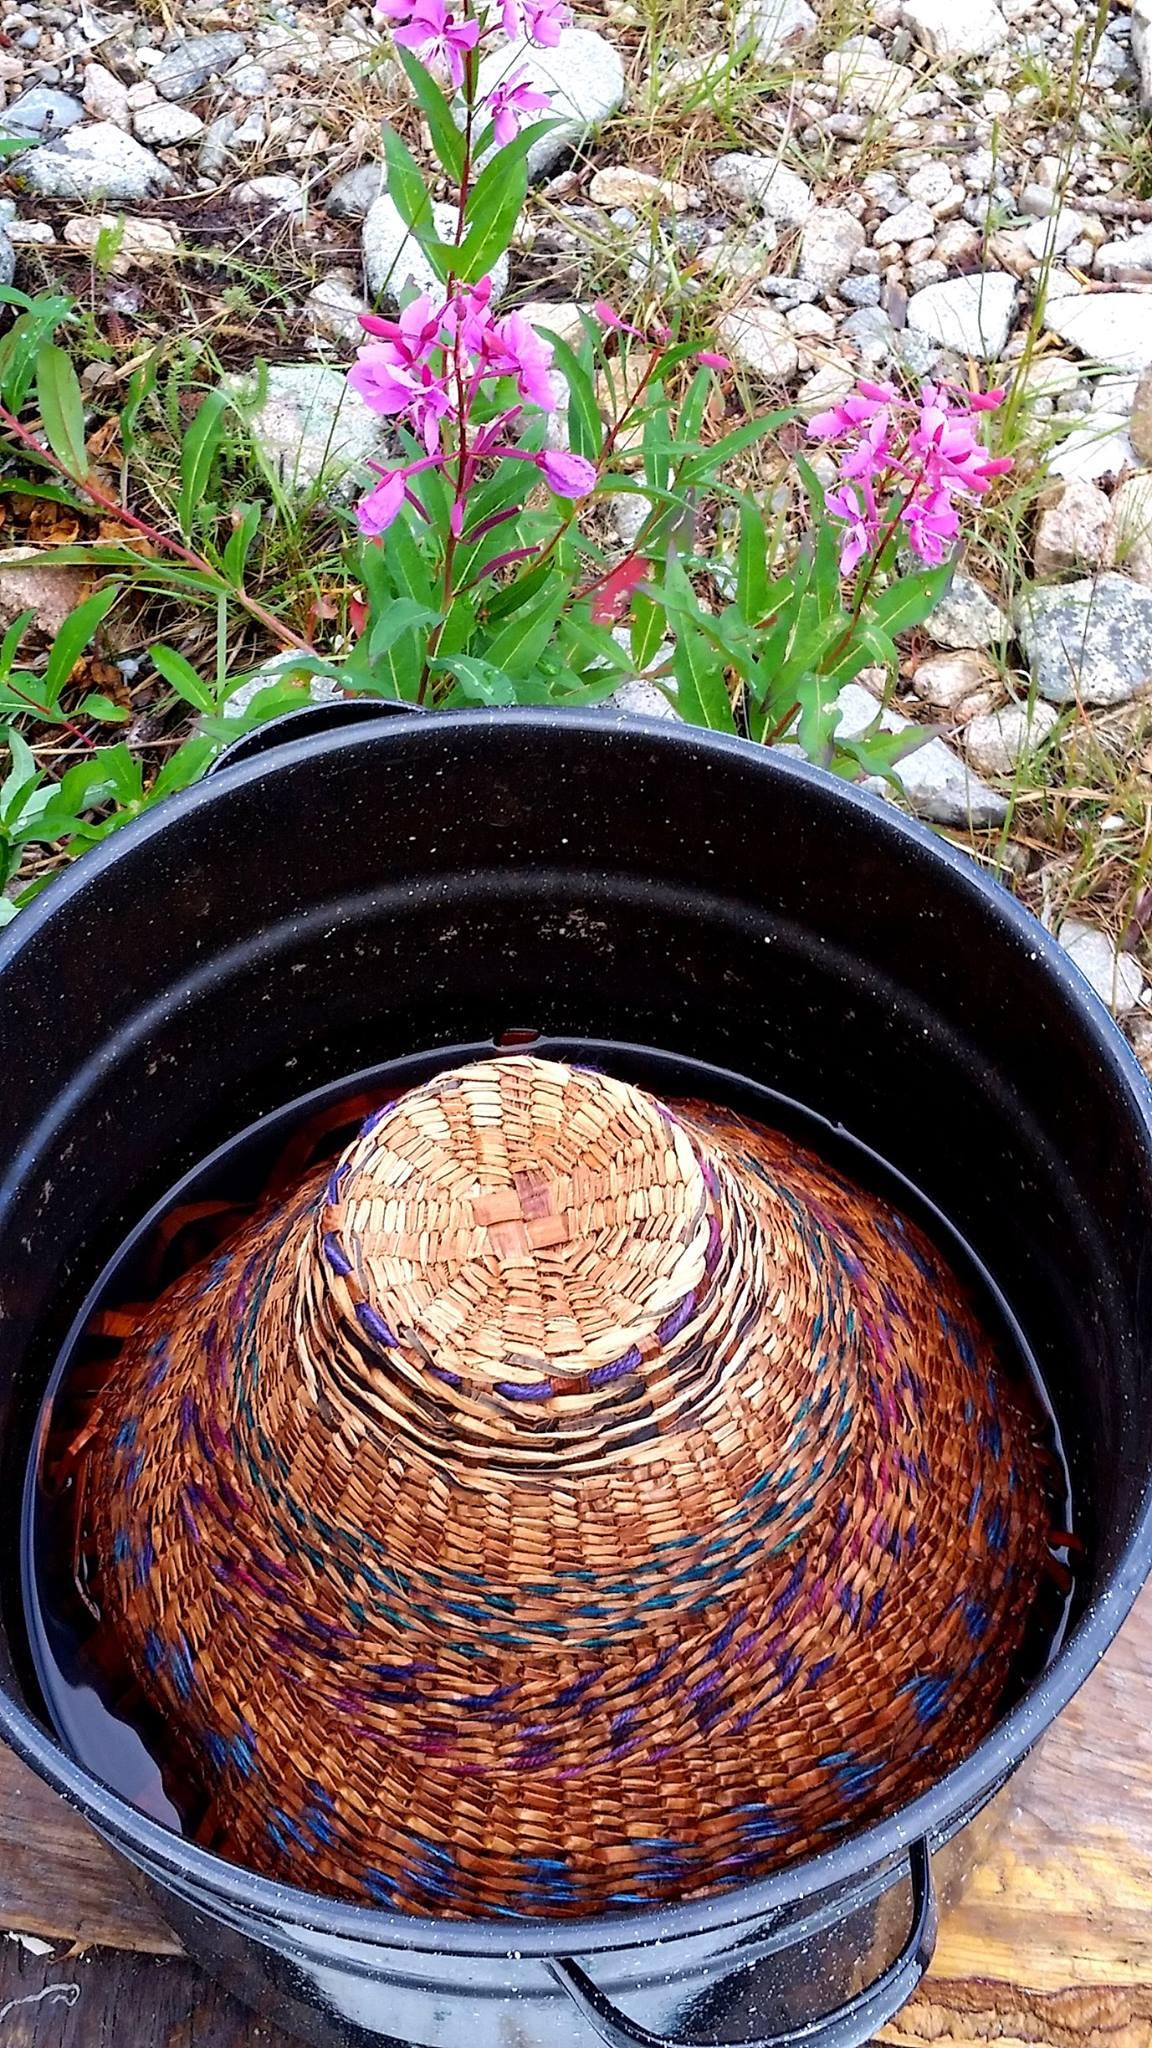 Chilkoot Hat